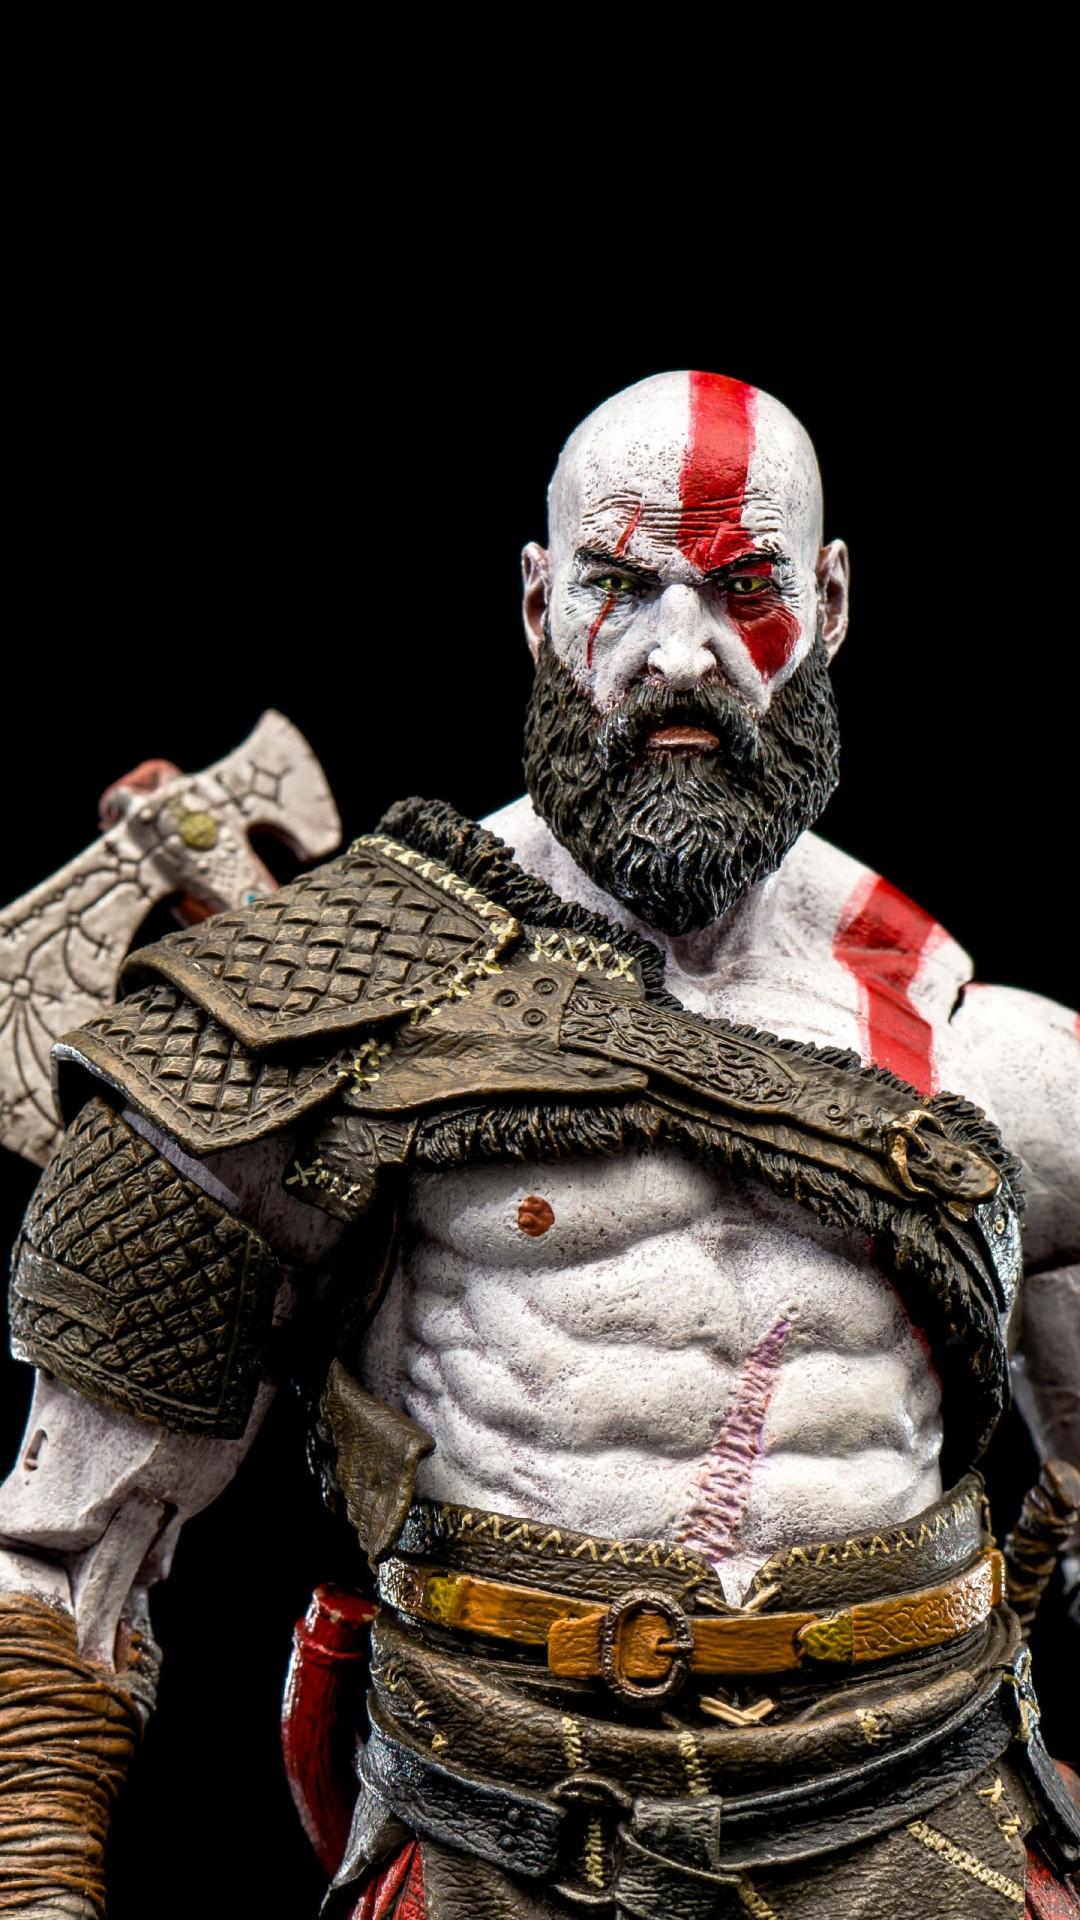 God Of War 4 Wallpaper Iphone X God Of War Kratos 2018 4k Wallpapers Hd Wallpapers Id